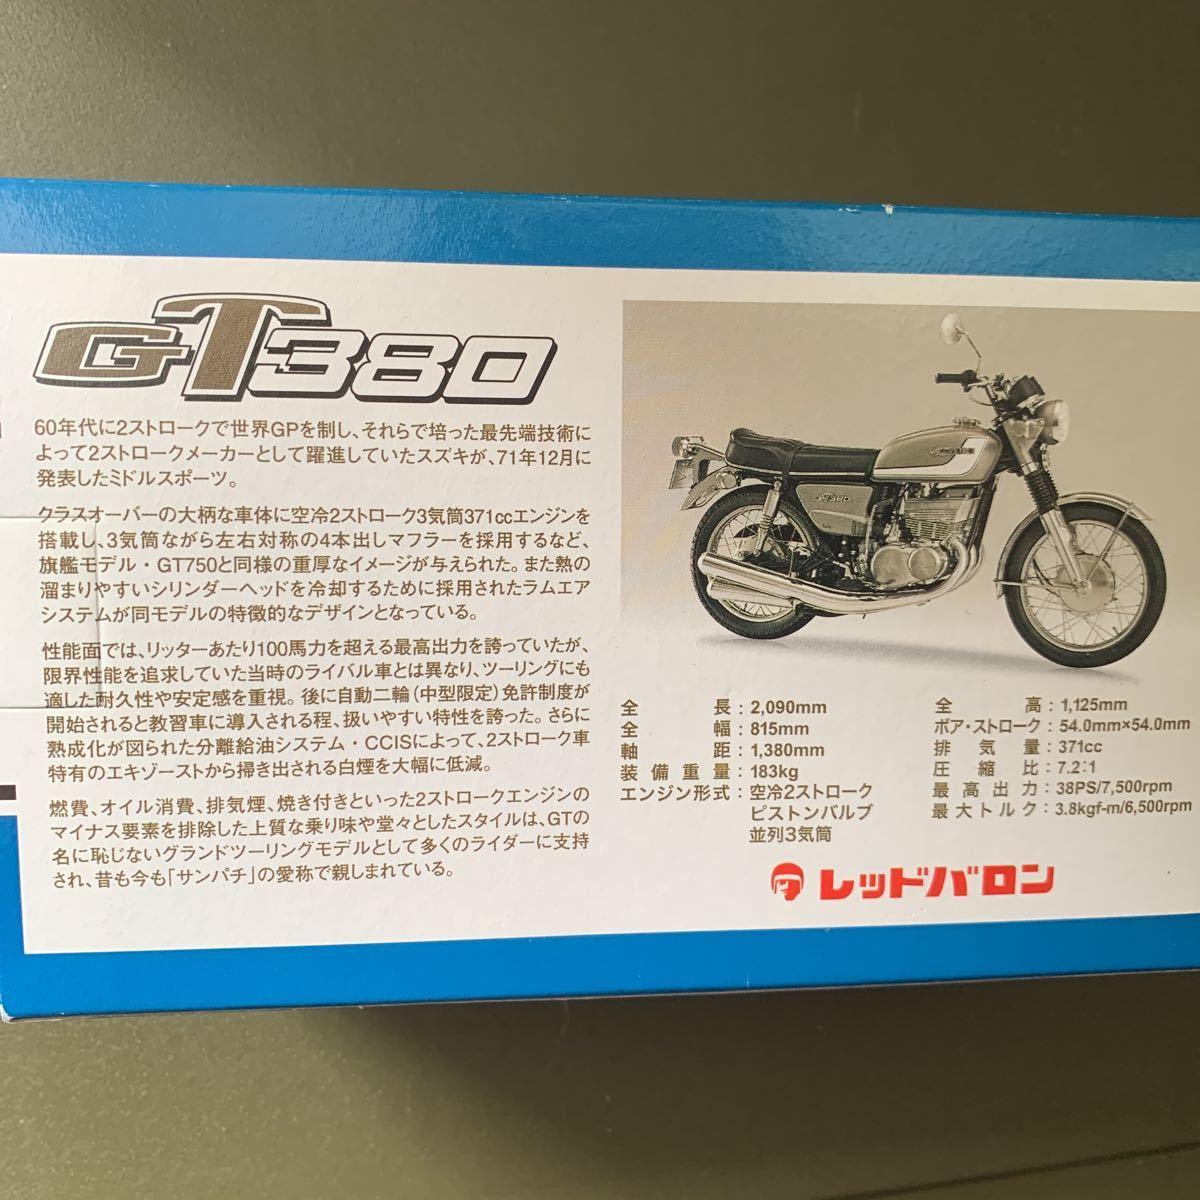 K_DSC0054 世界の名車シリーズ vol.37 SUZUKI GT380 レッドバロン ミニレプリカ バイクのインテリアミニカー_画像2